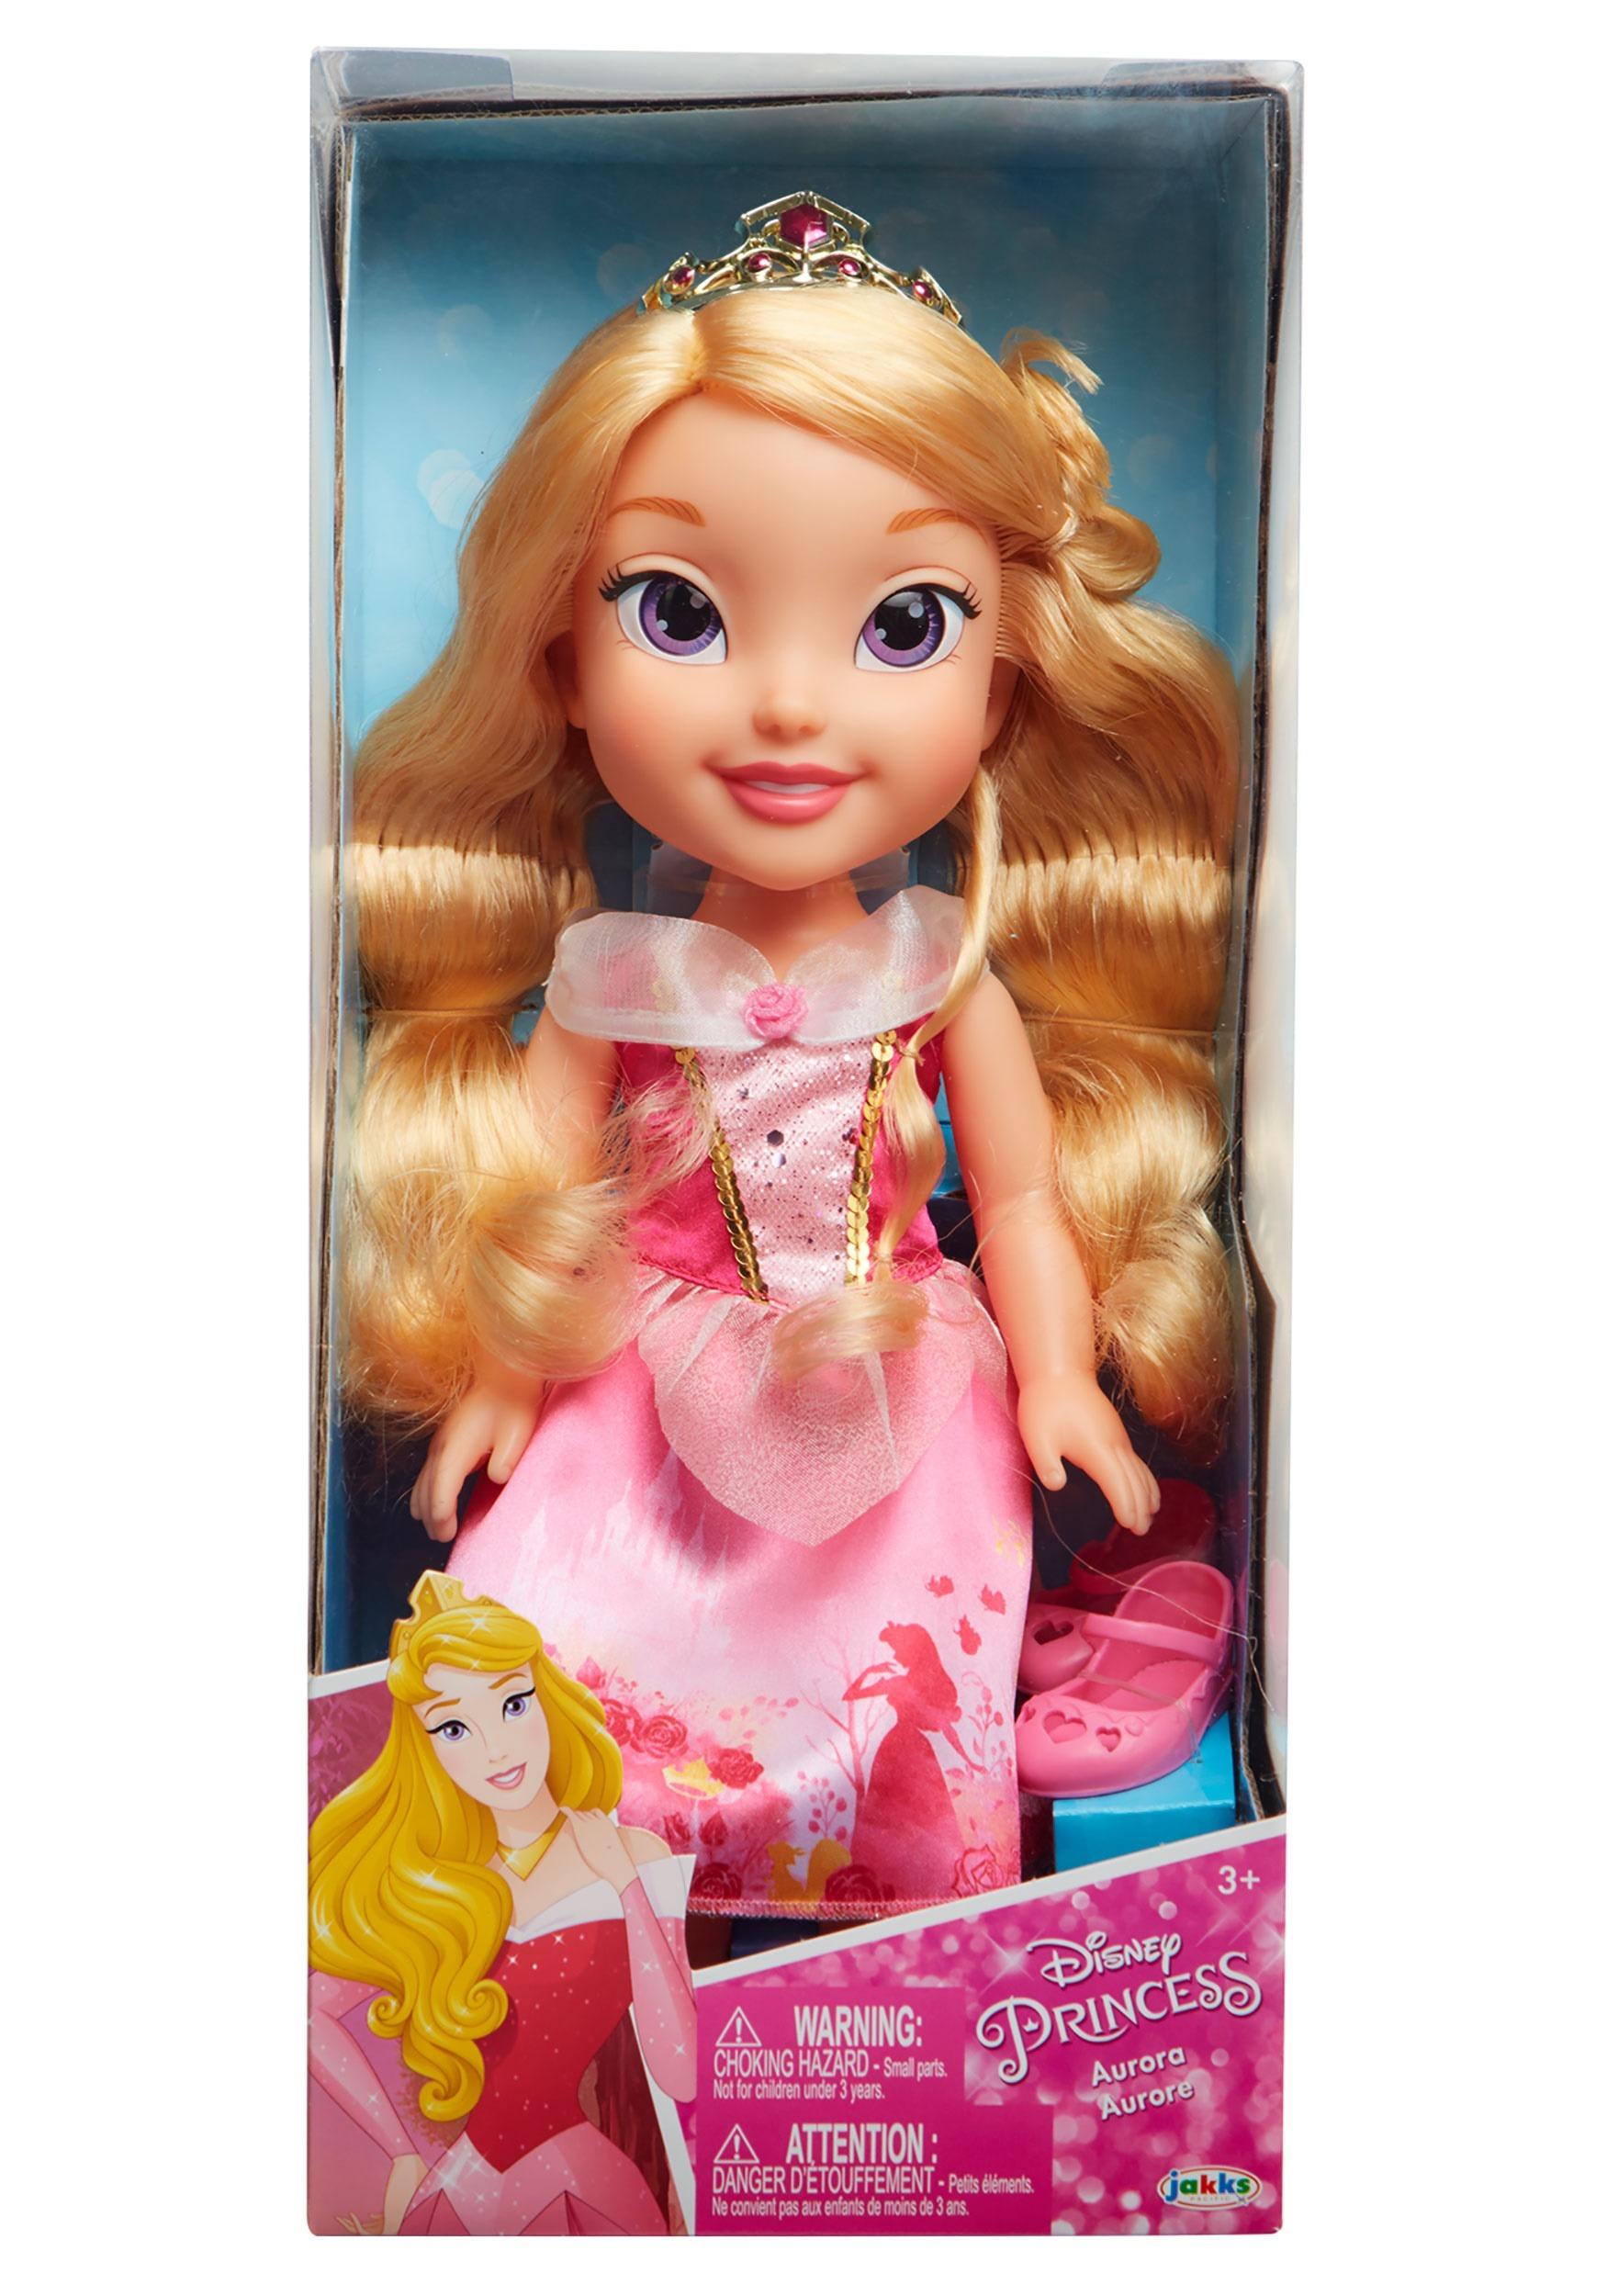 Disney Princess Aurora Large Doll